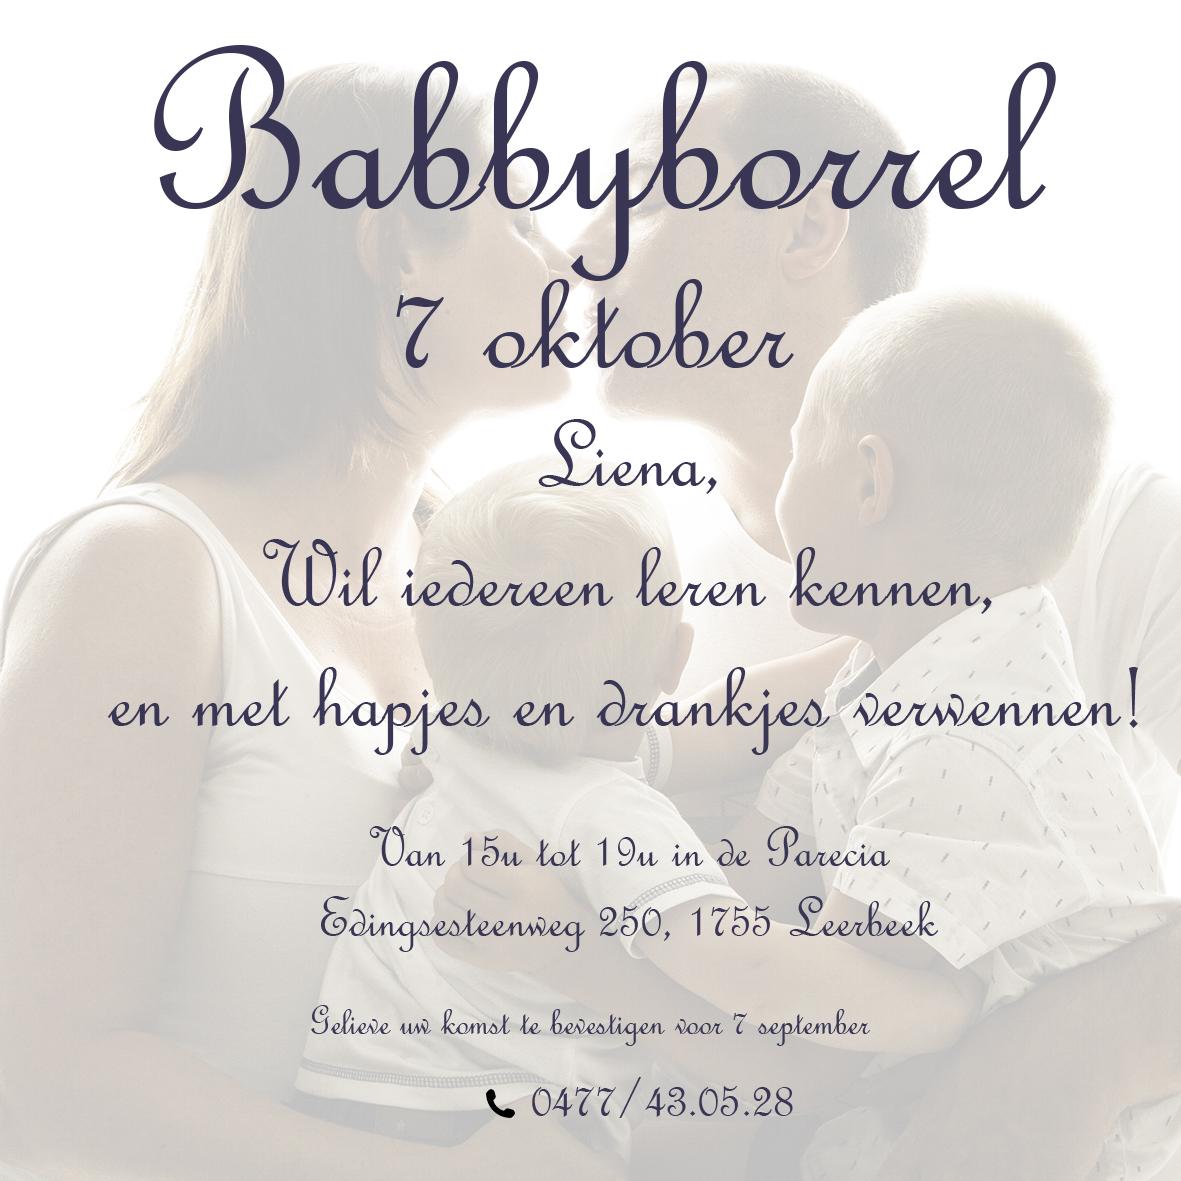 babbyborrel